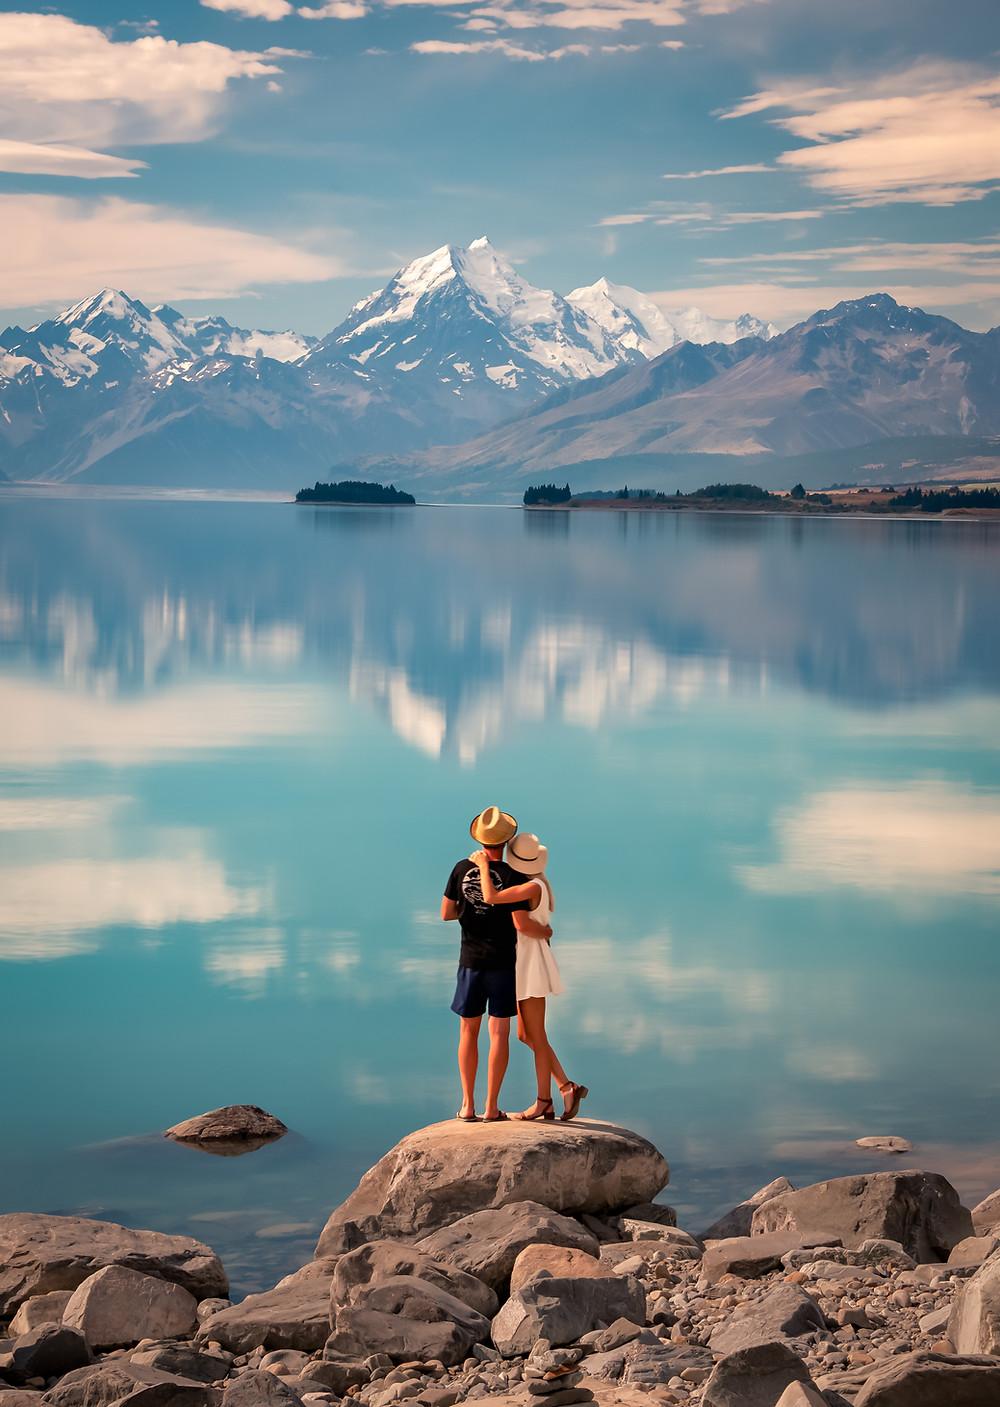 Lake Pukaki Mount Cook Aoraki